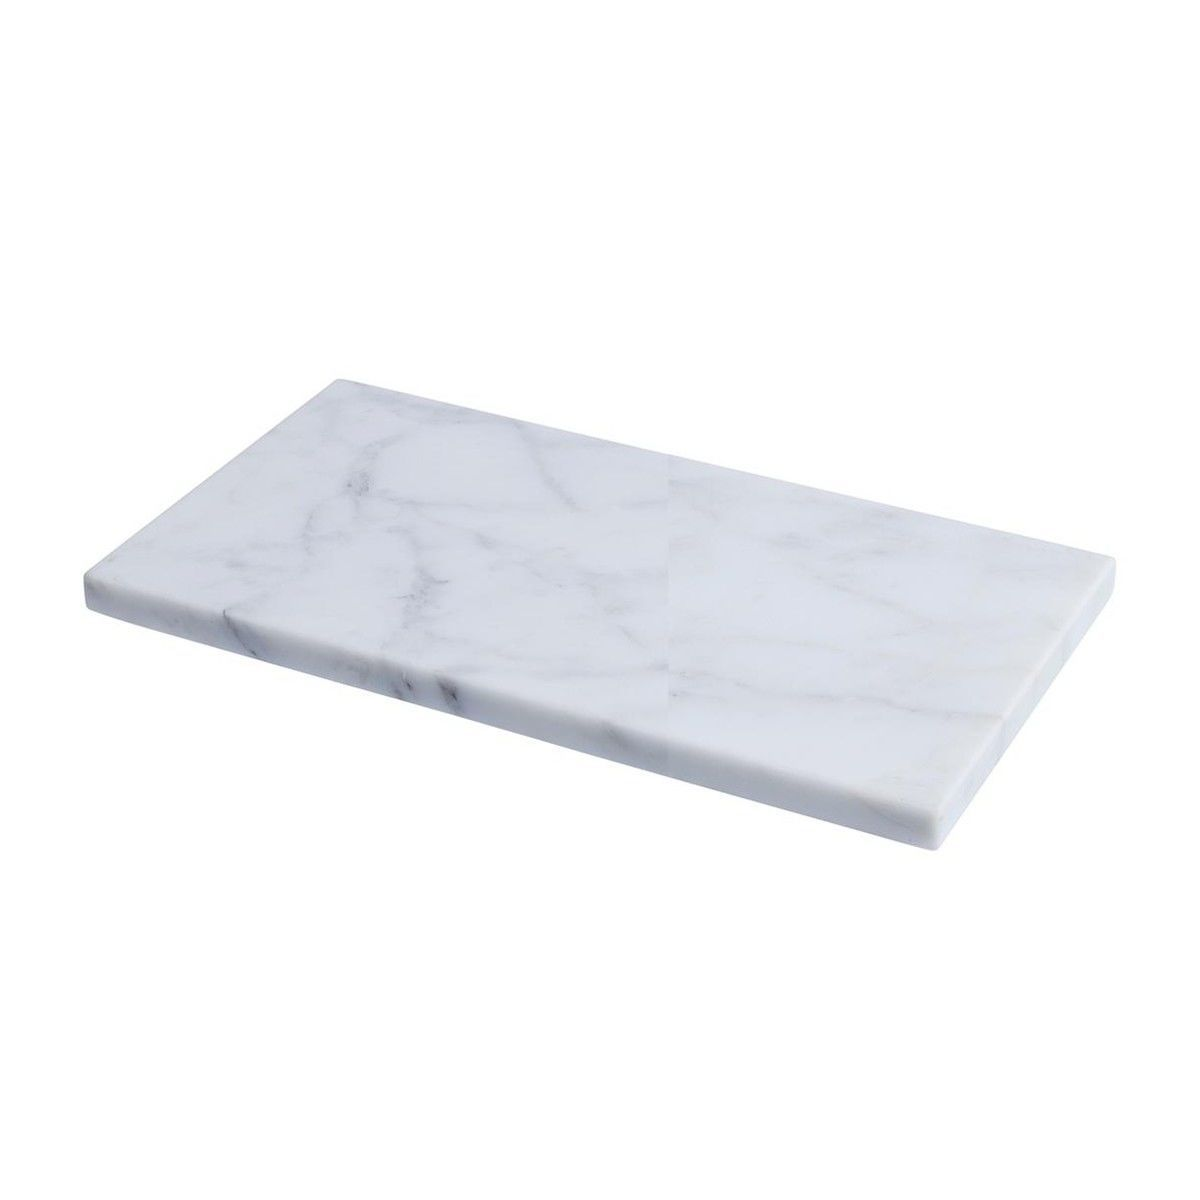 chop chop planche d couper marbre hay. Black Bedroom Furniture Sets. Home Design Ideas